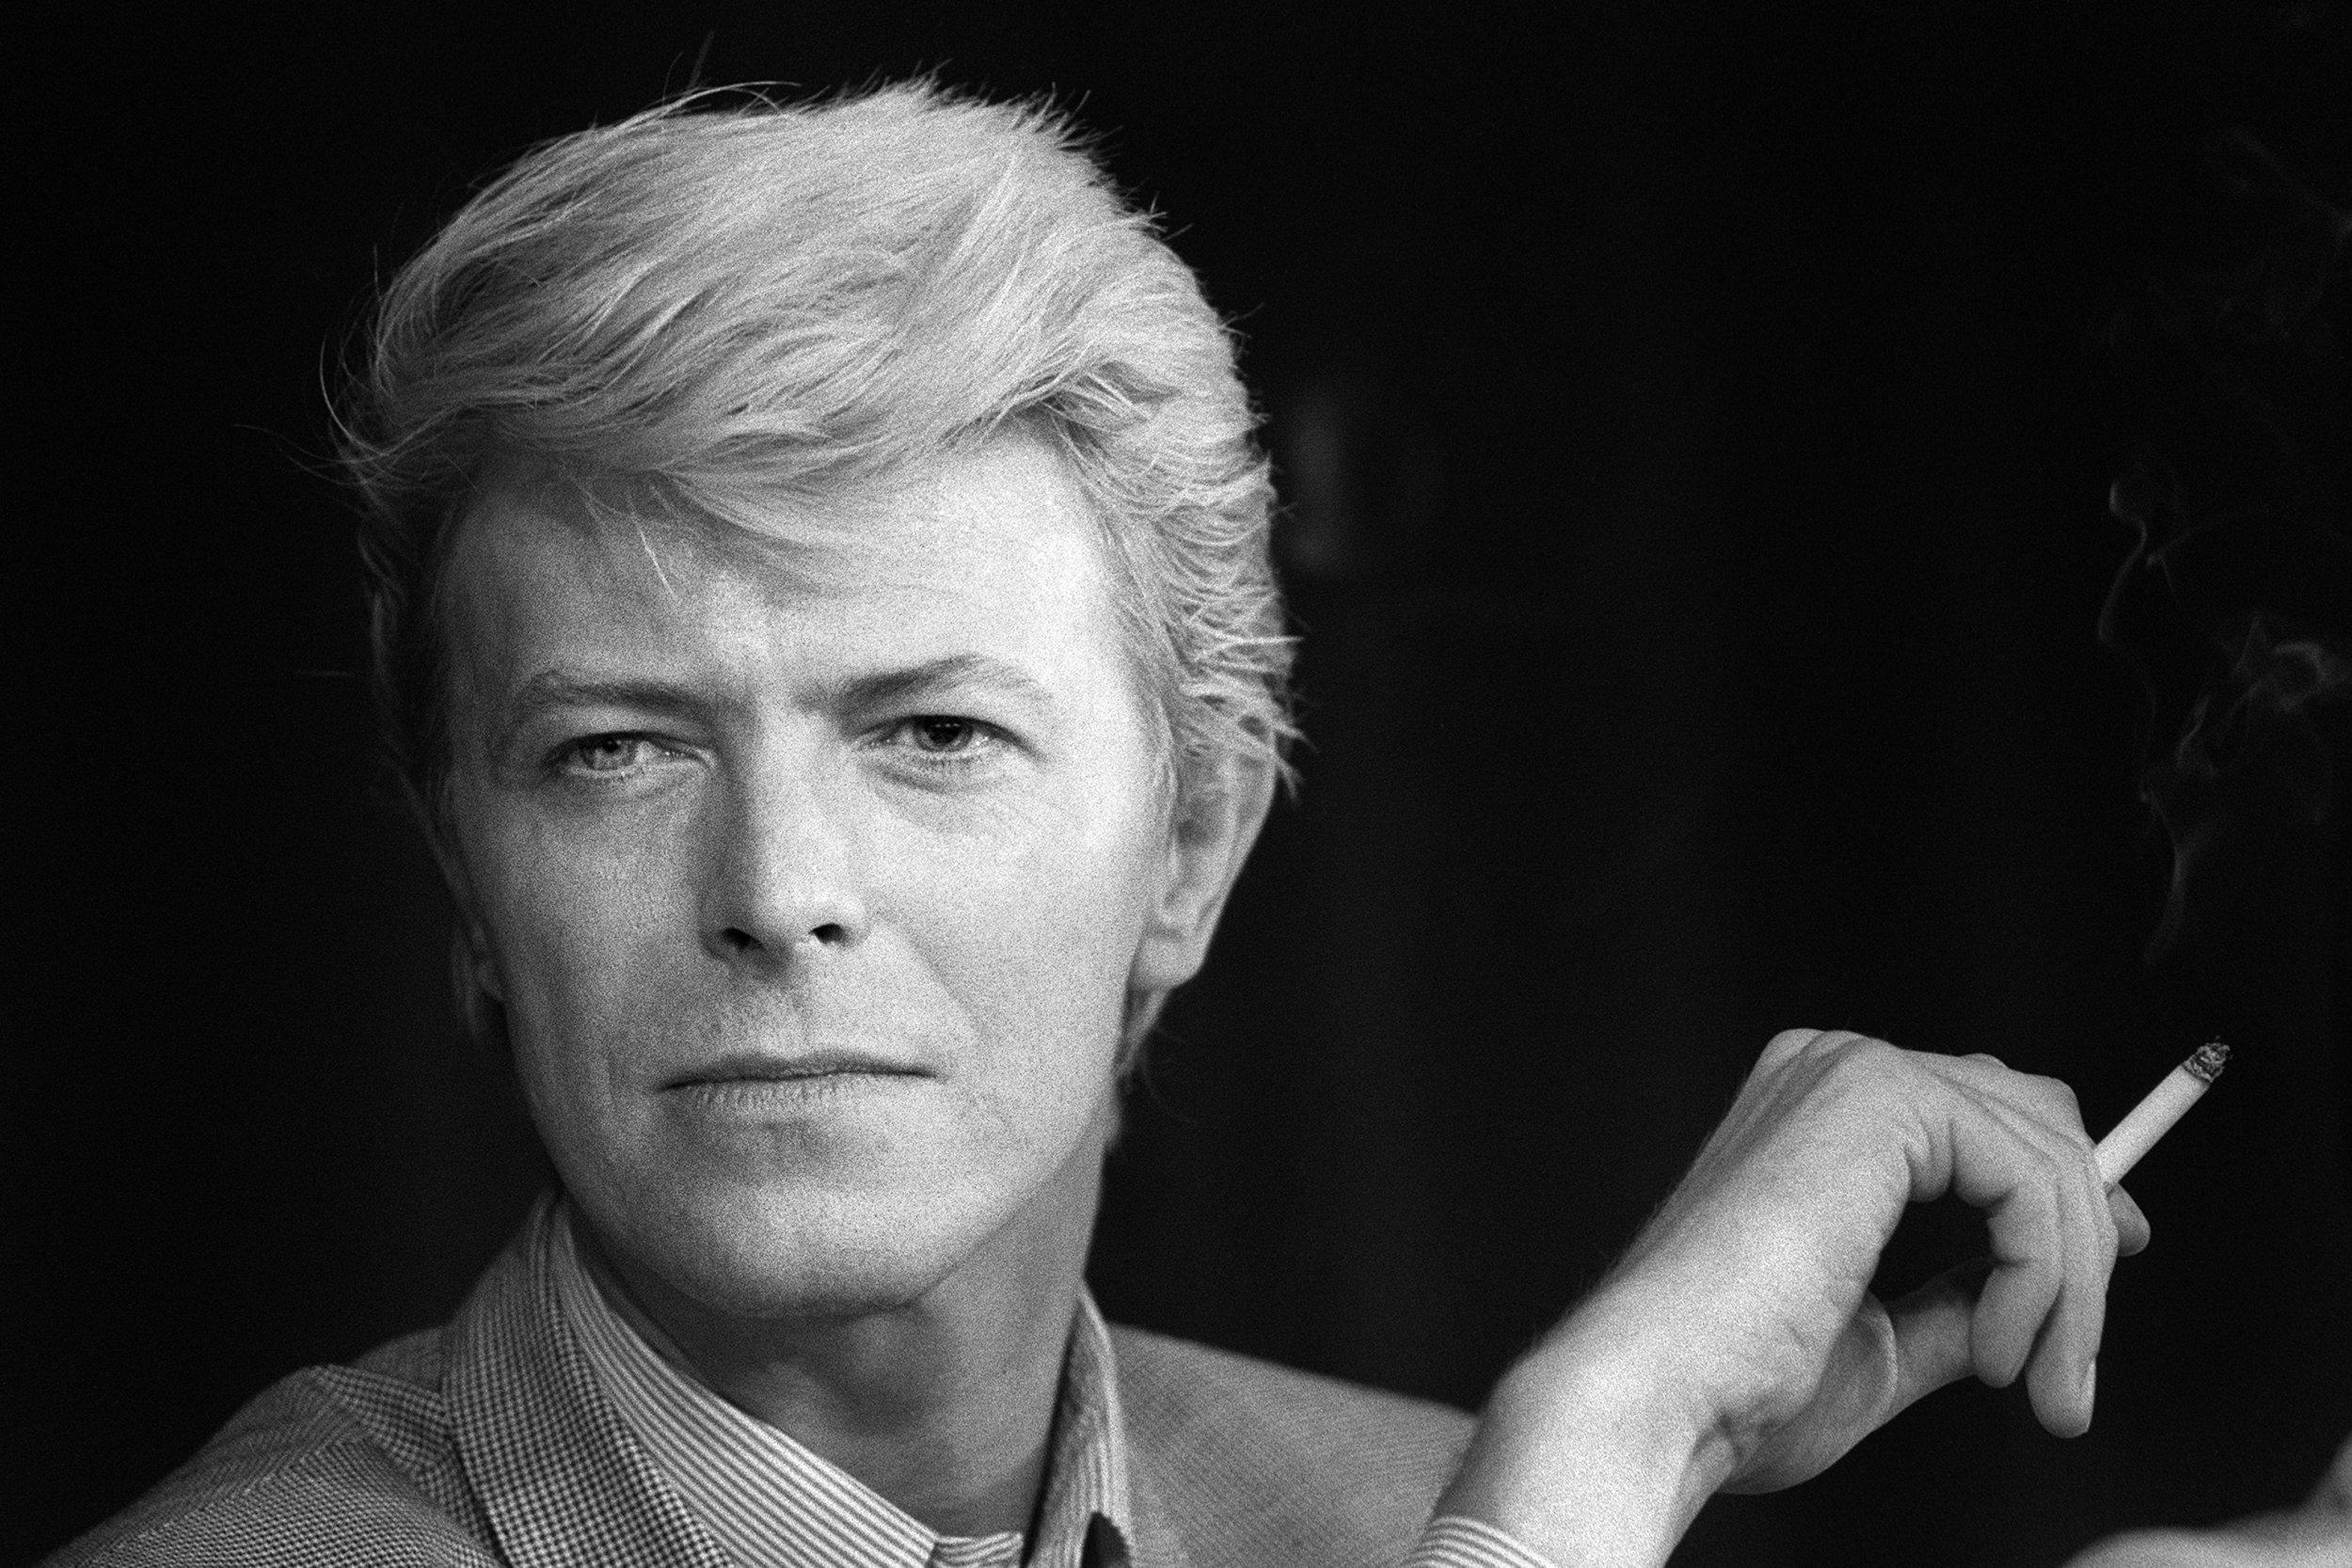 01_12_David_Bowie_01